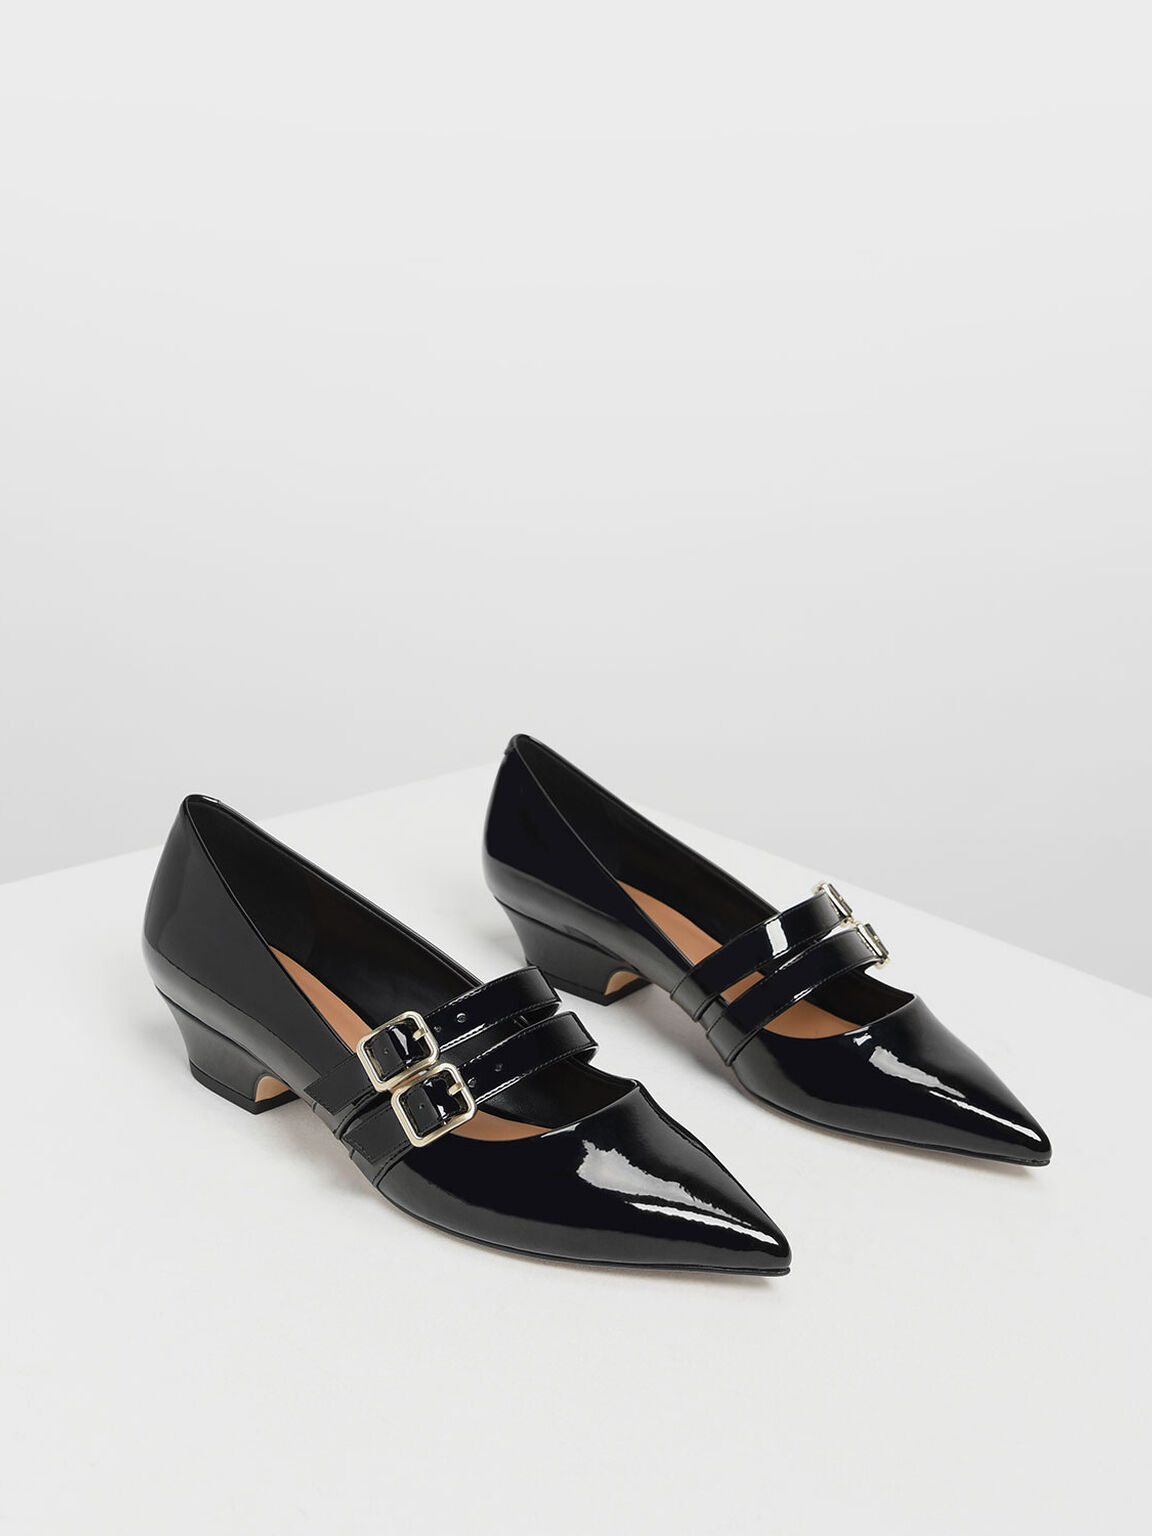 Double Strap Mary Jane Pumps, Black, hi-res